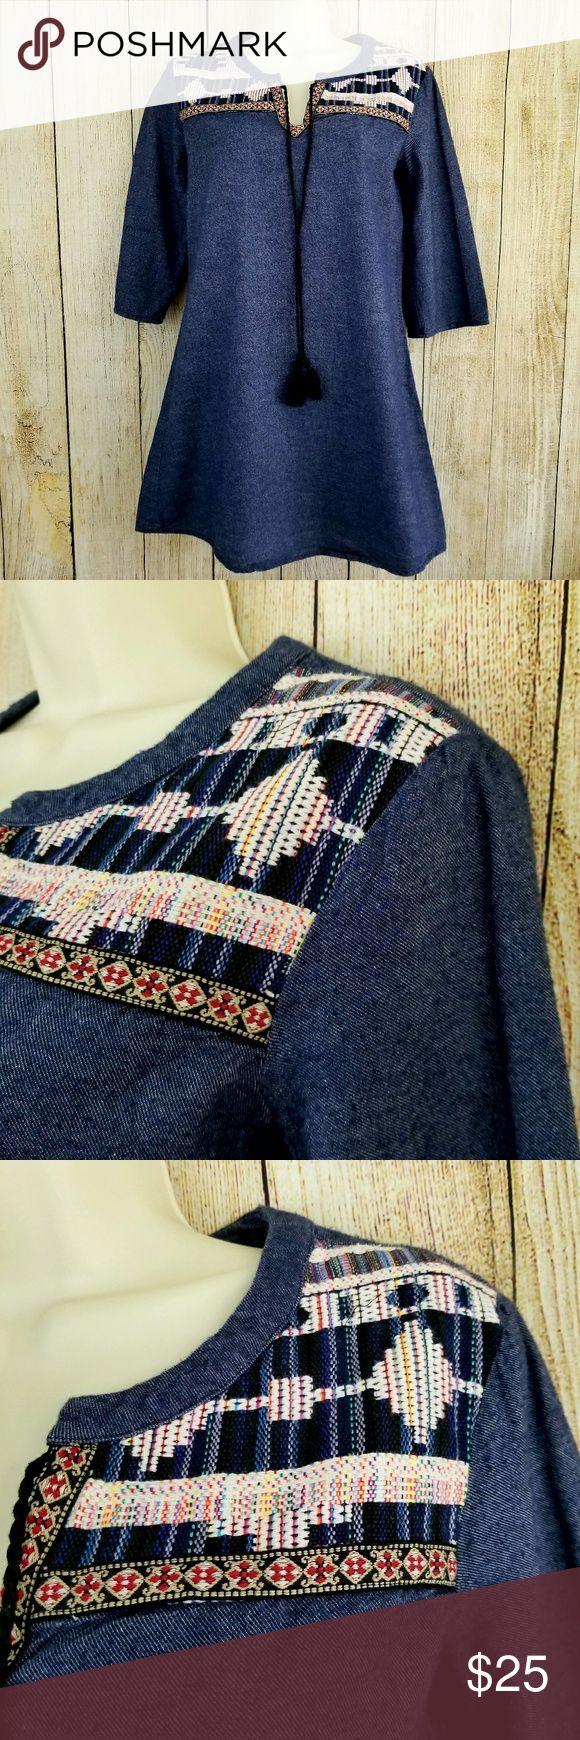 "Boho aztec denim dress Soft denim aztec boho dress. Size small P, in like new condition. 100% cotton. Perfect for festival season!   Measurements armpit to armpit 17"" length 30"" Flying Tomato Dresses"